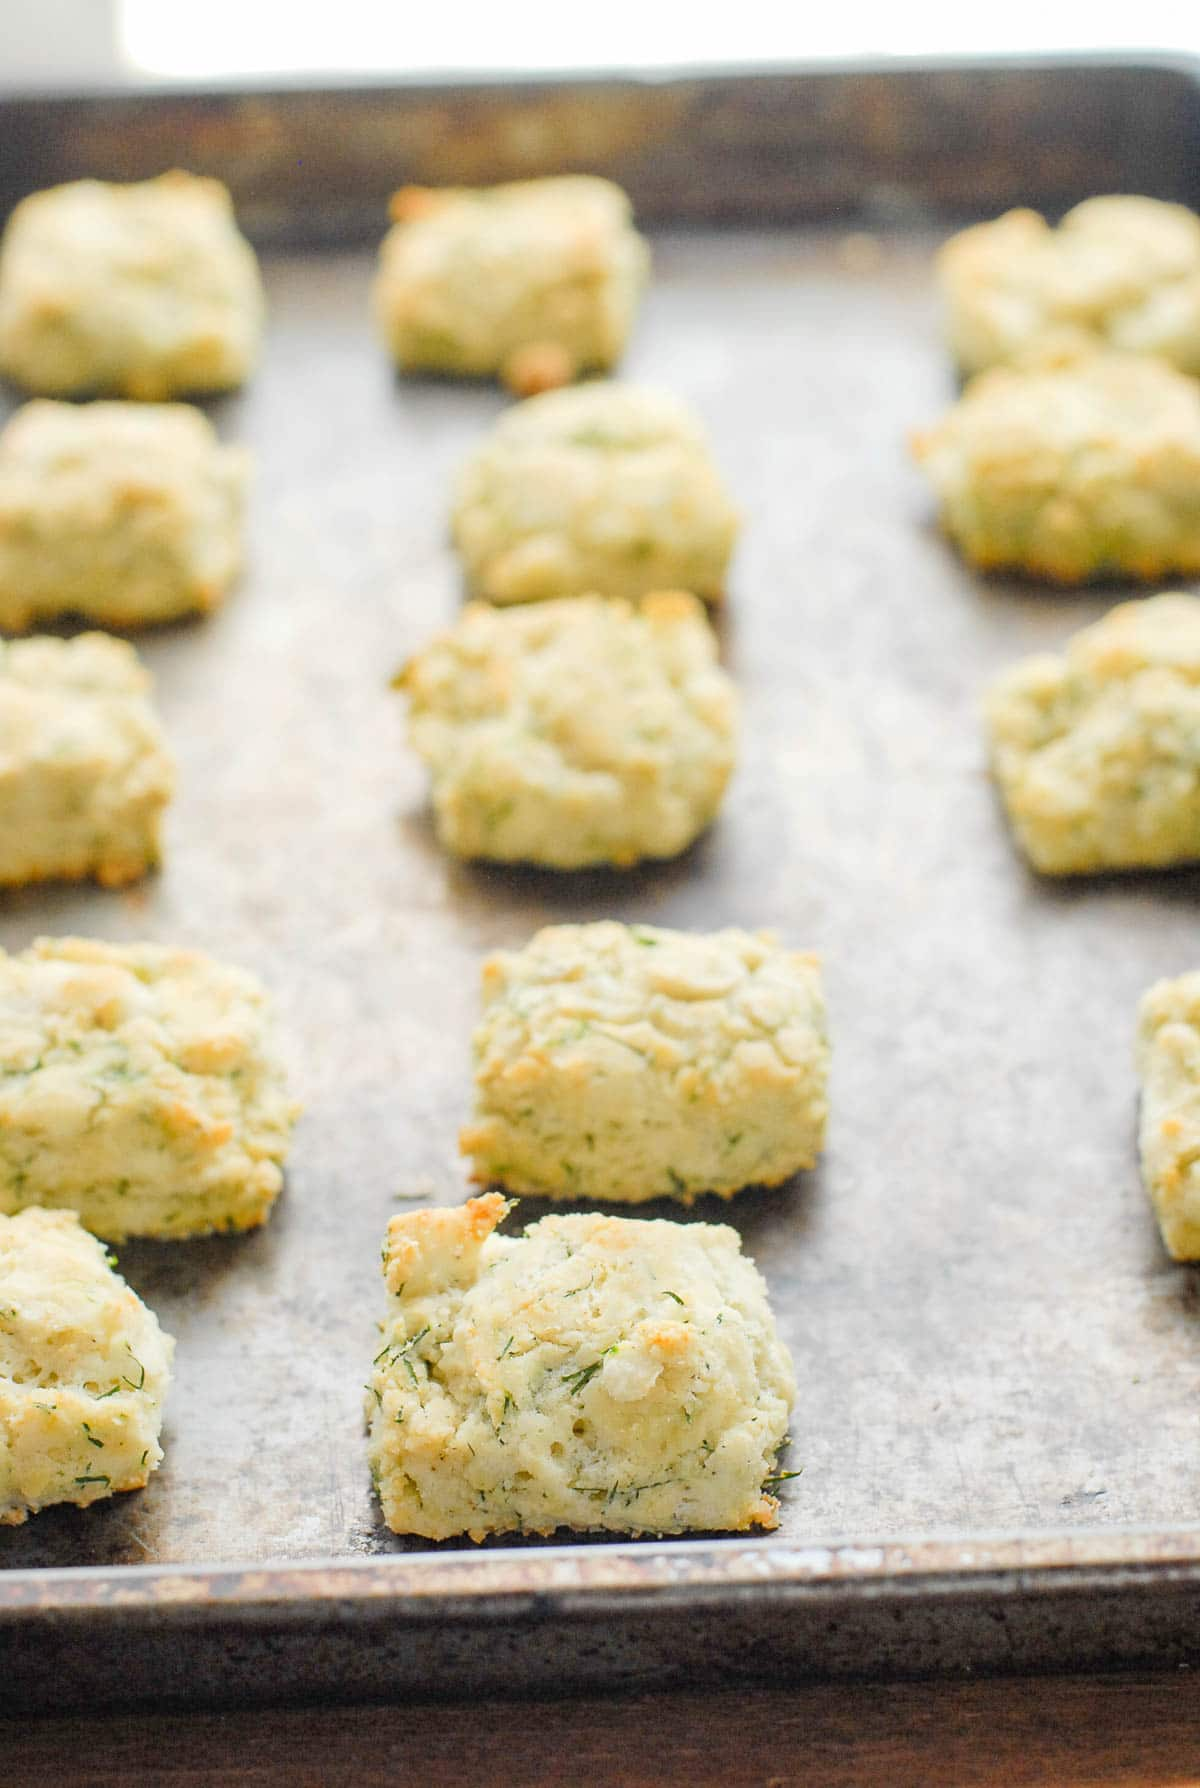 buttermilk biscuits ON BAKING SHEET